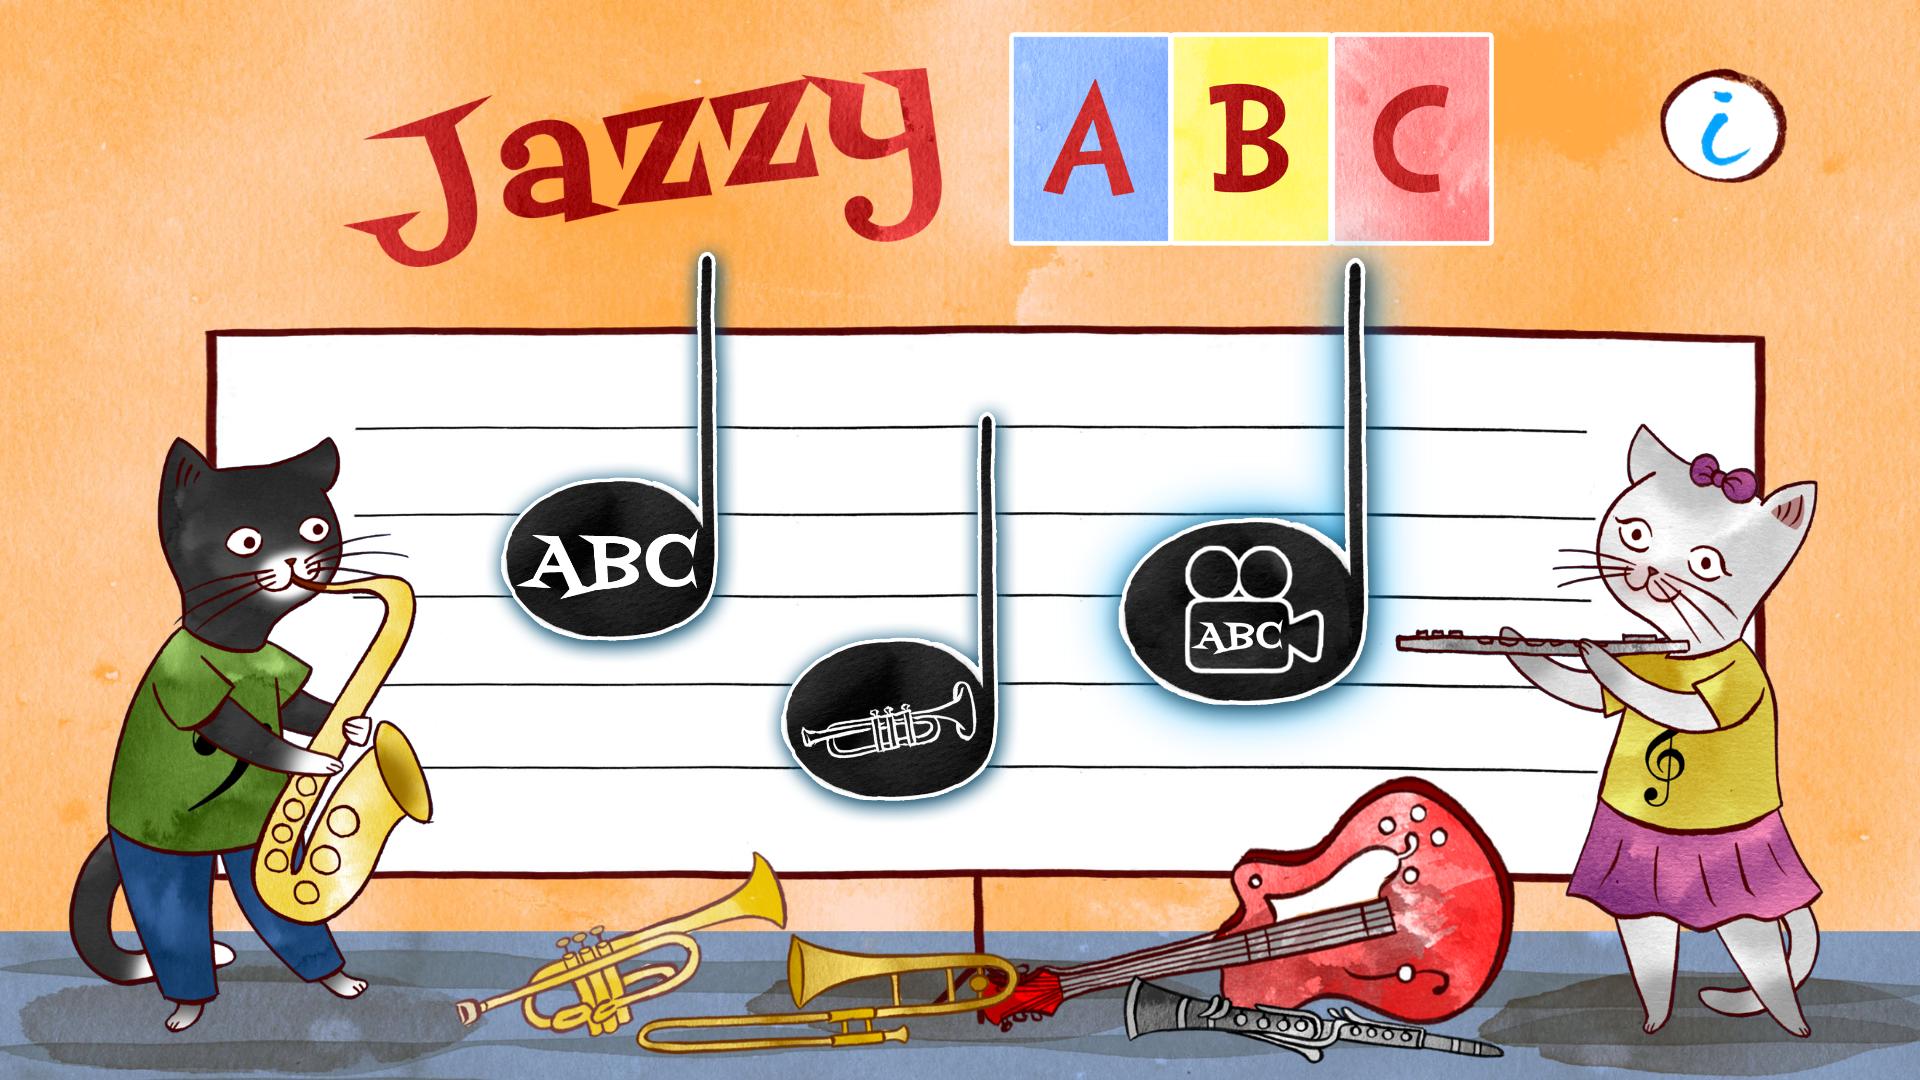 Jazzy ABC - Music Education screenshot 11